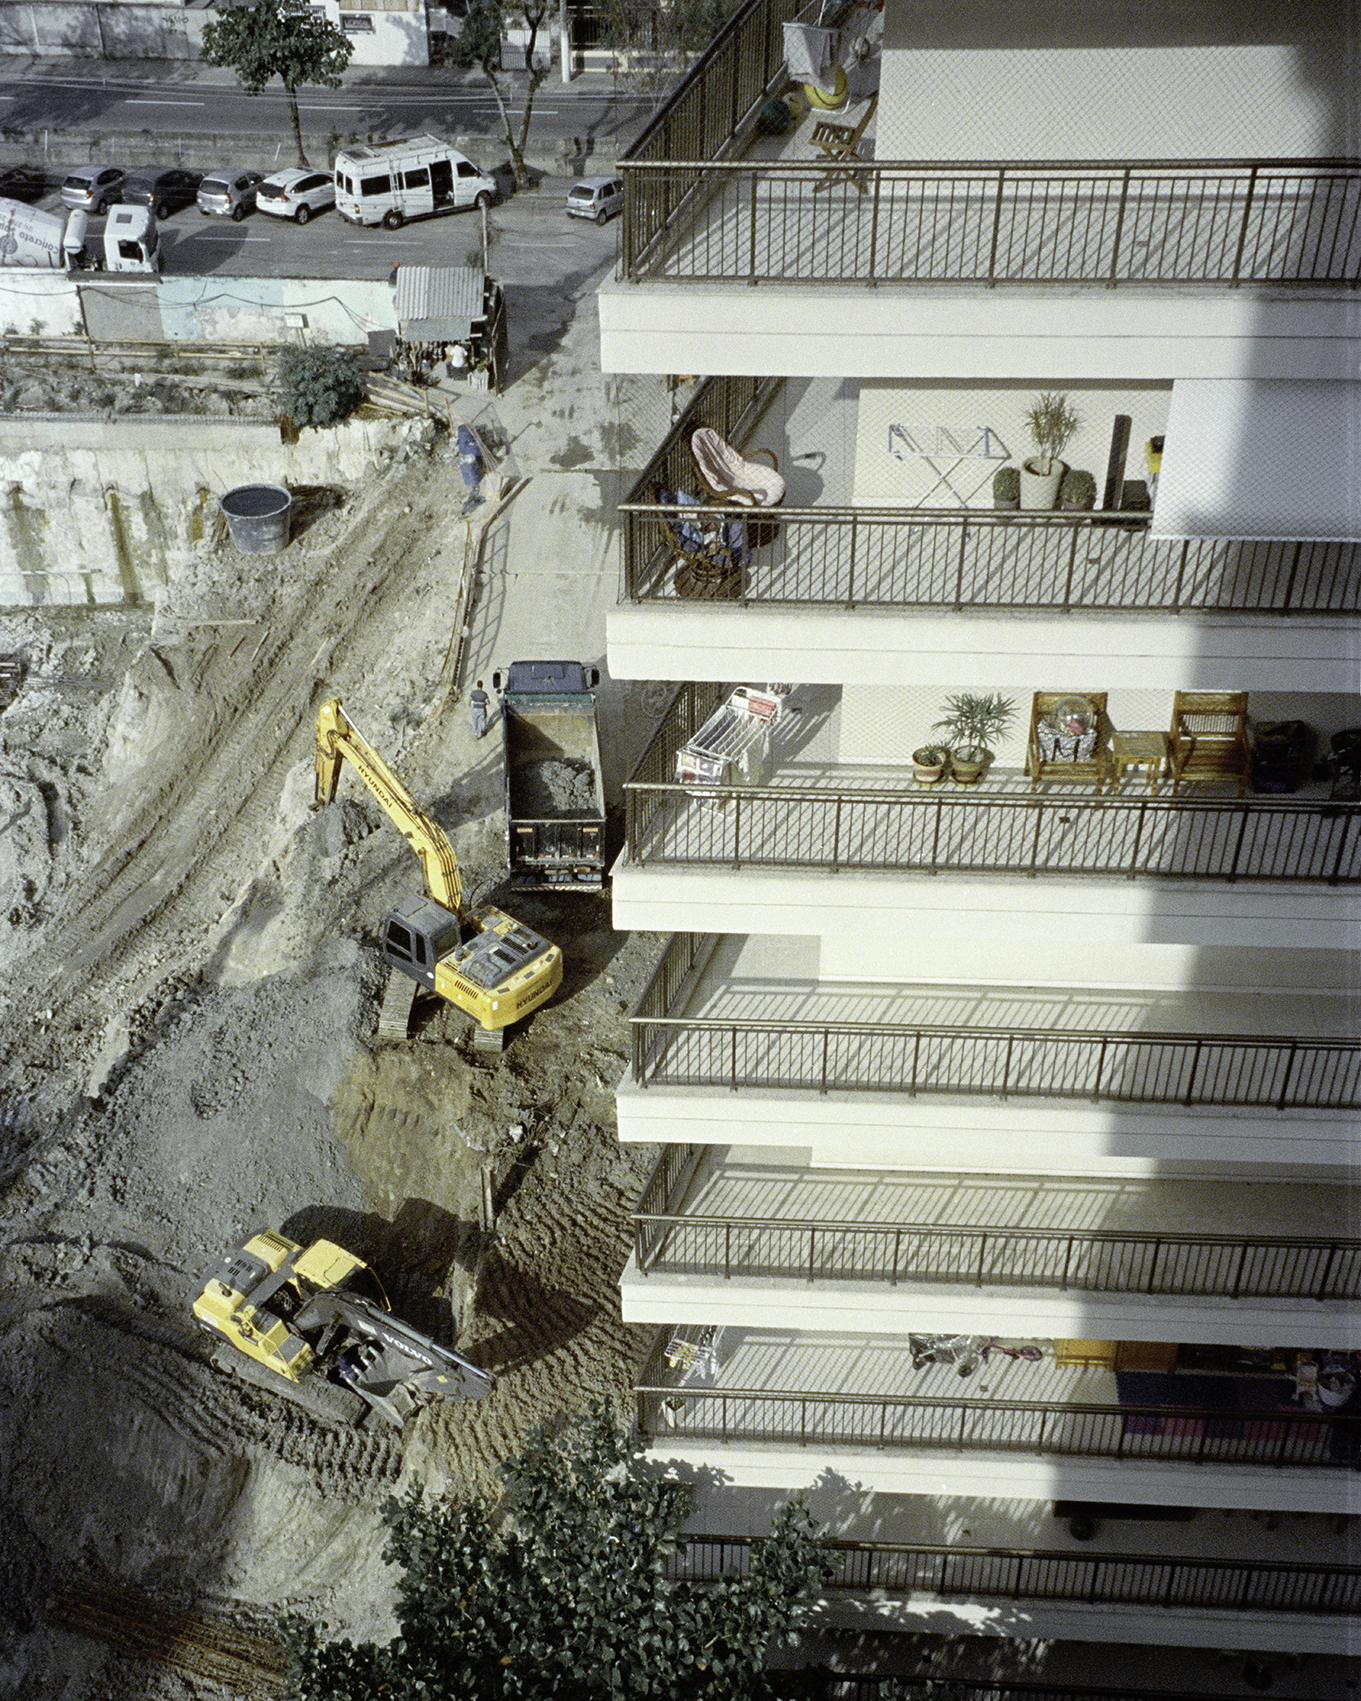 3 construction site.jpg